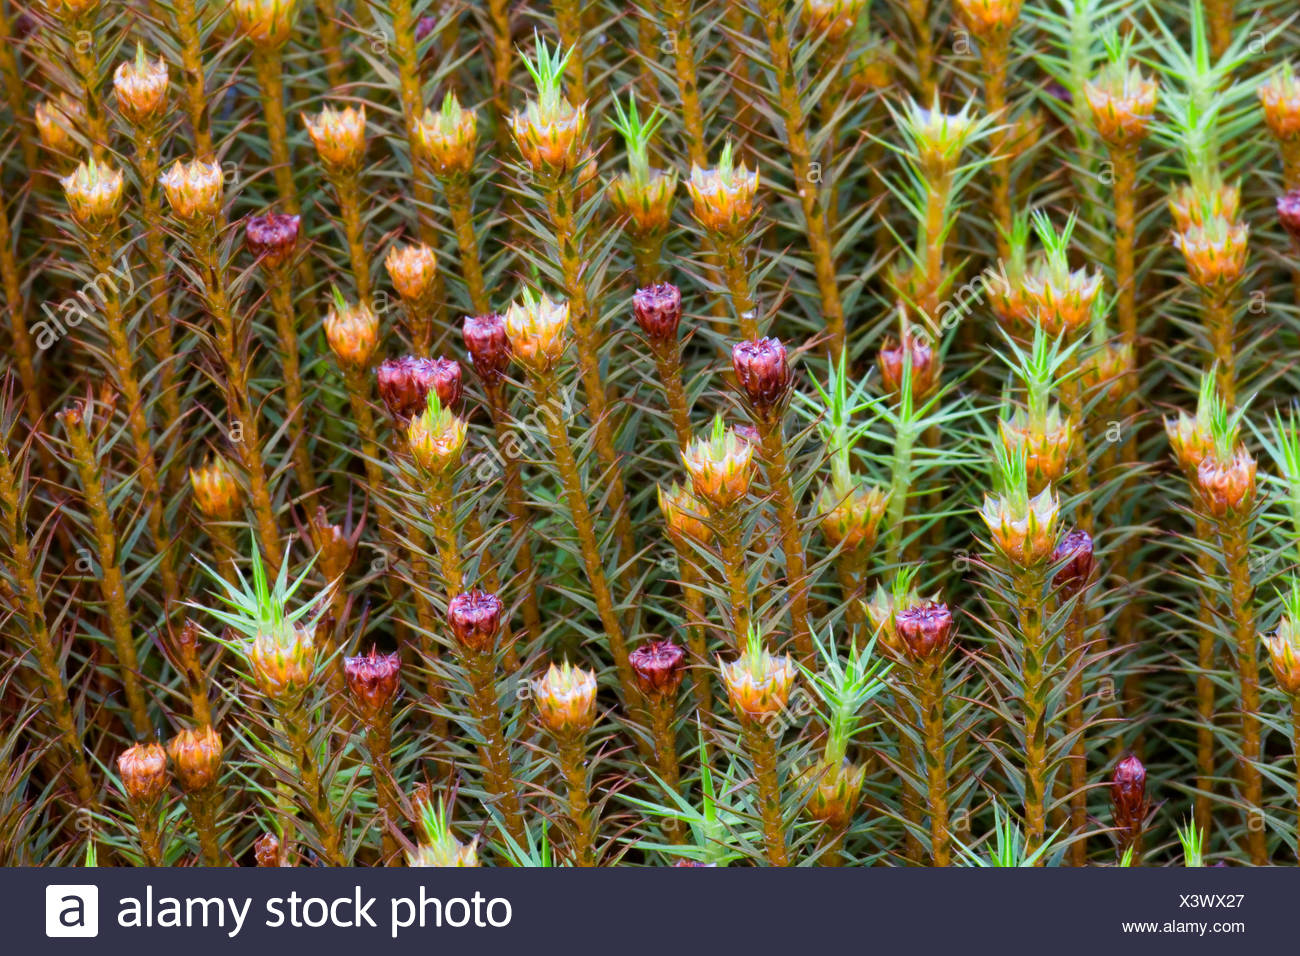 hight resolution of hair cap moss polytrichum commune perichaetia germany schleswig holstein